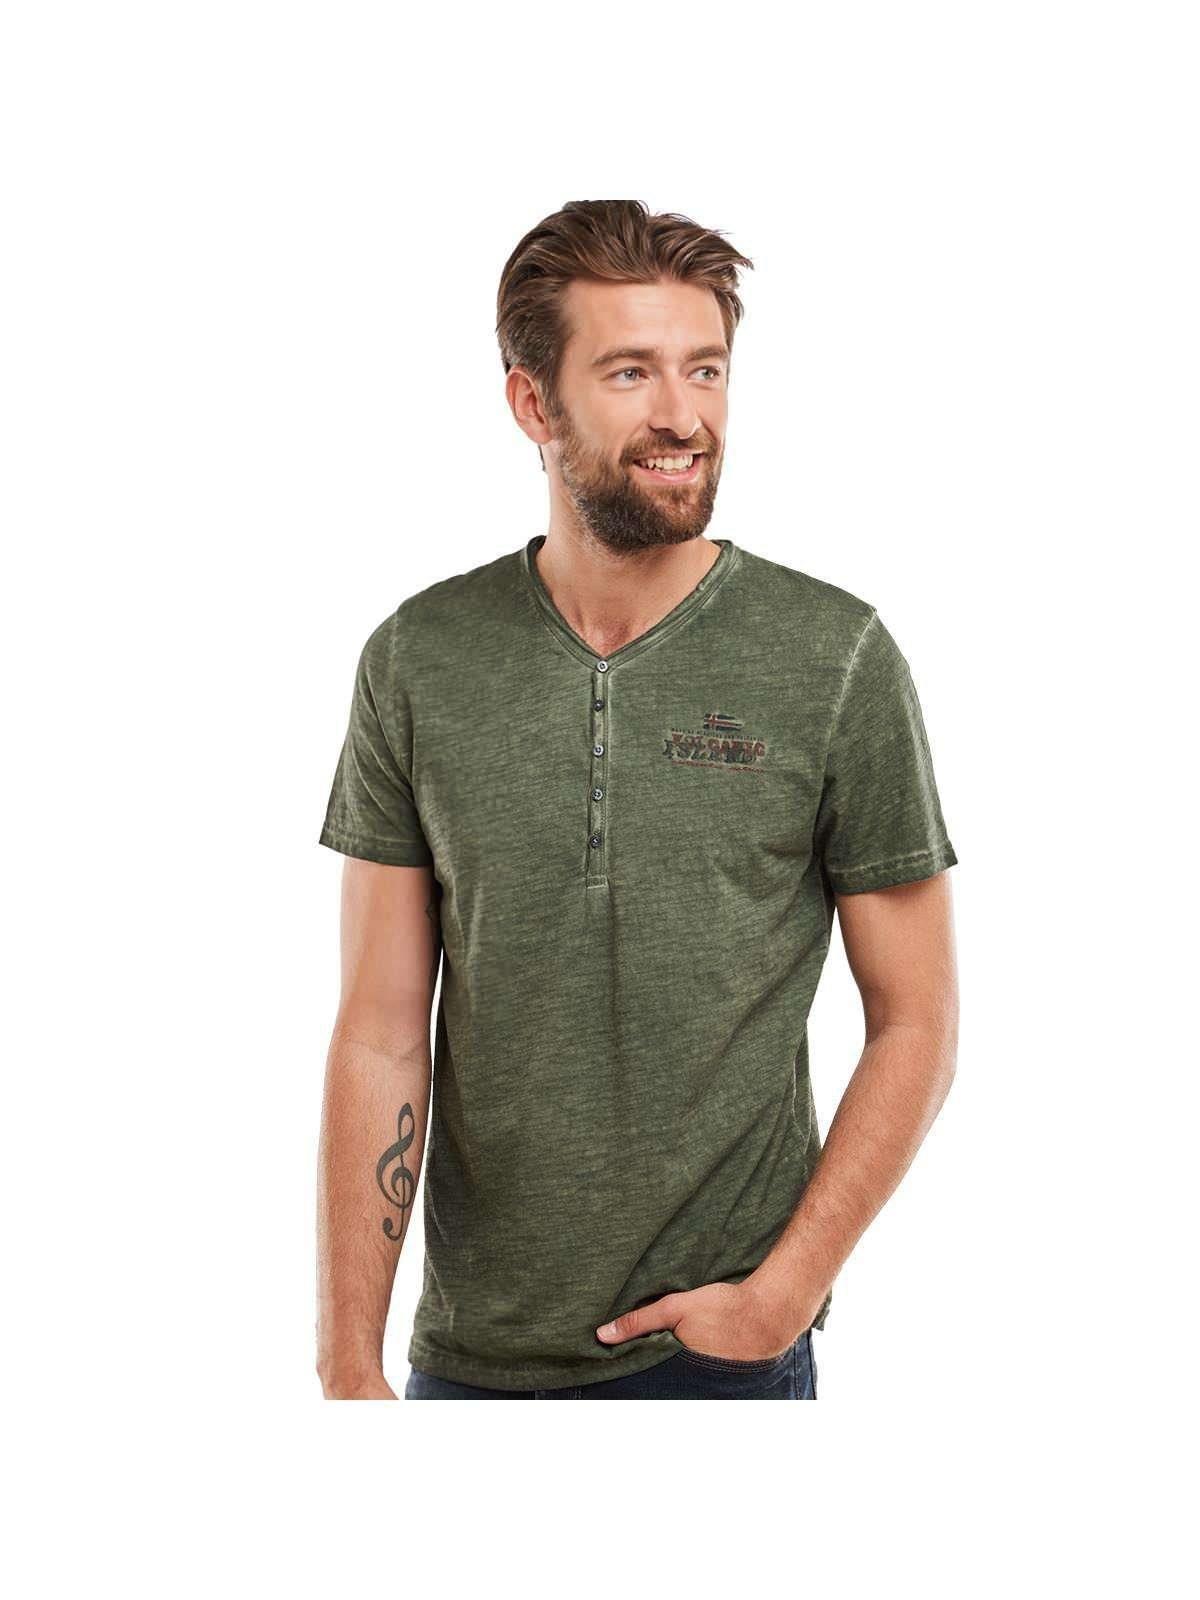 engbers Henley T-Shirt   Bekleidung > Shirts > Sonstige Shirts   Grün   Baumwolle   Engbers